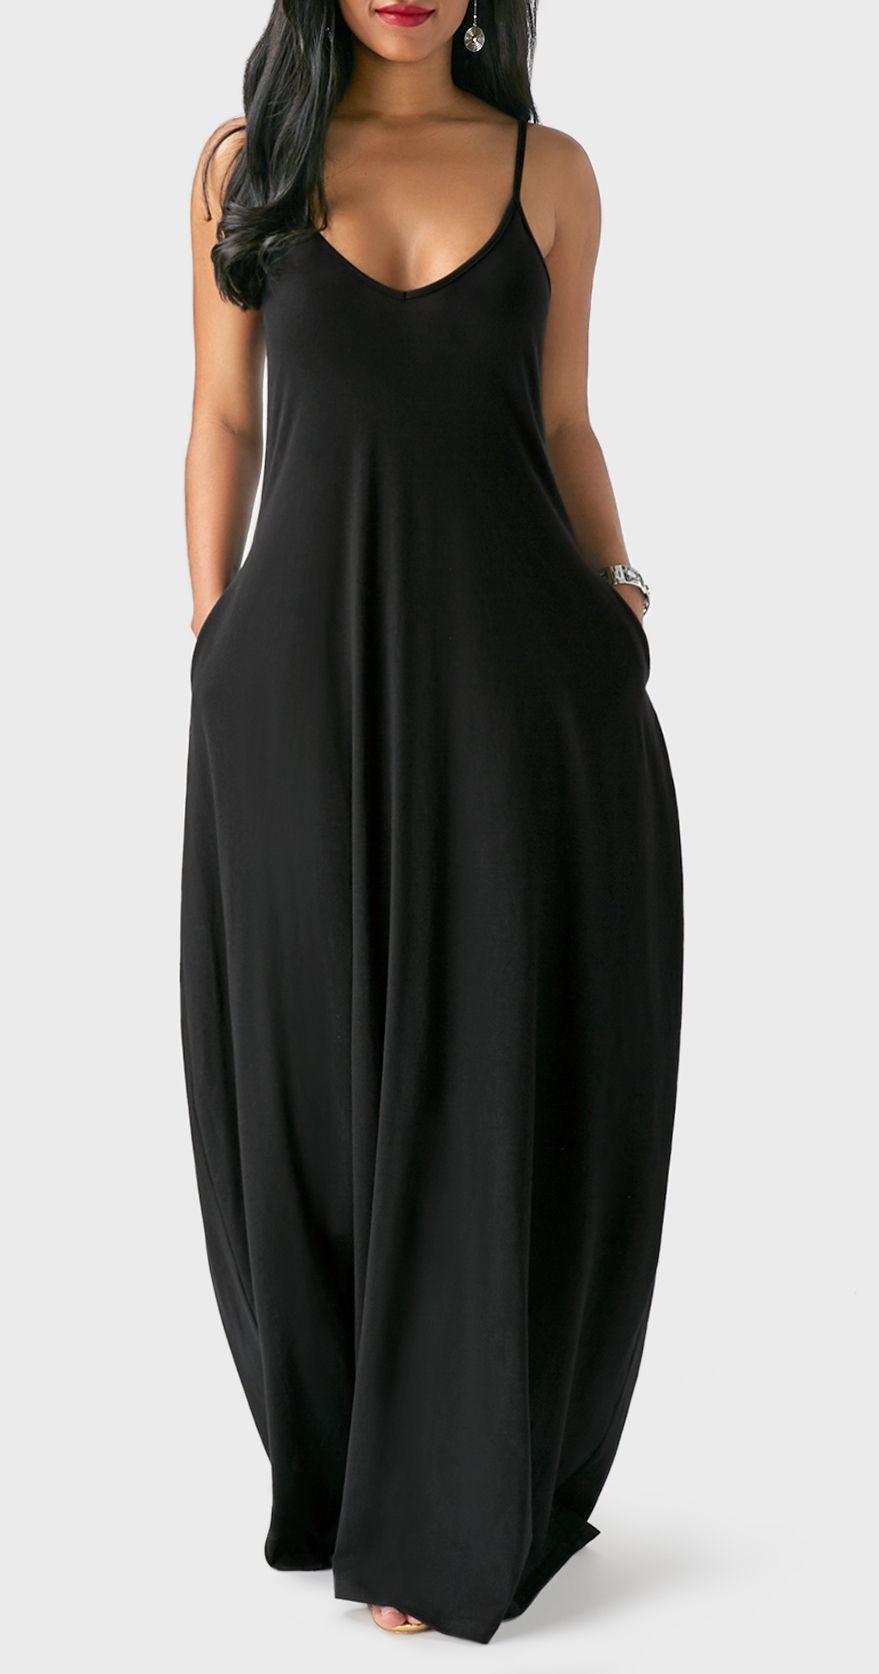 f7de73862b28 Black Spaghetti Strap Baggy Maxi Dress